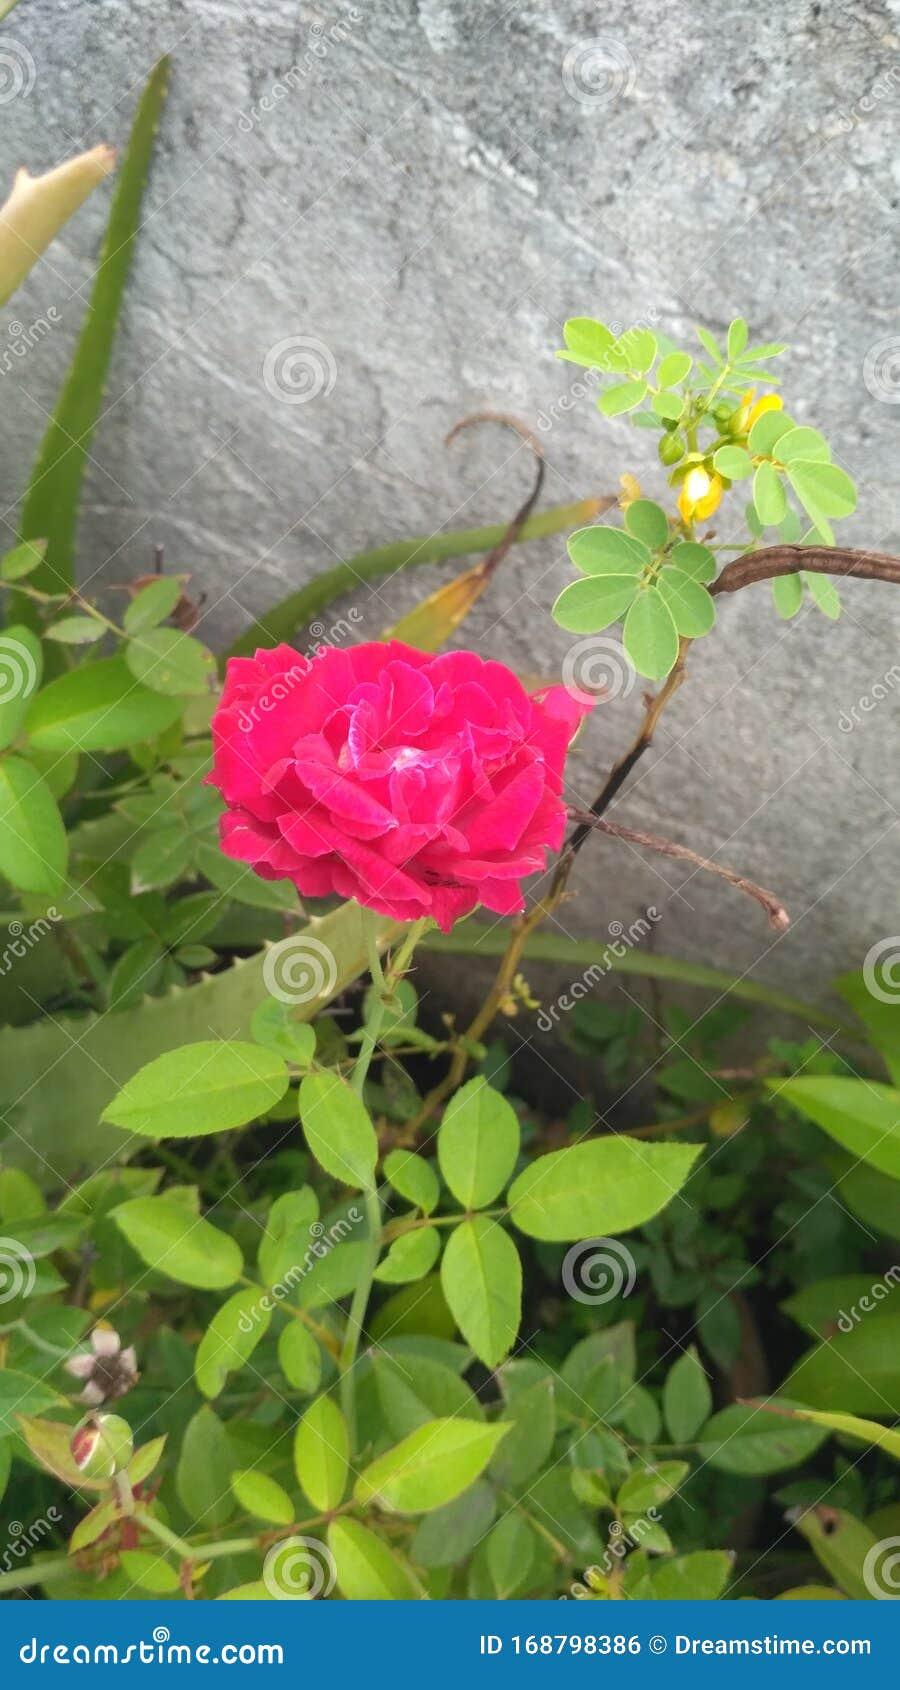 Indian Beautiful Plant Beautiful Rose Stock Photo Image Of Shrub Name 168798386,Vegan Burger Recipe Easy